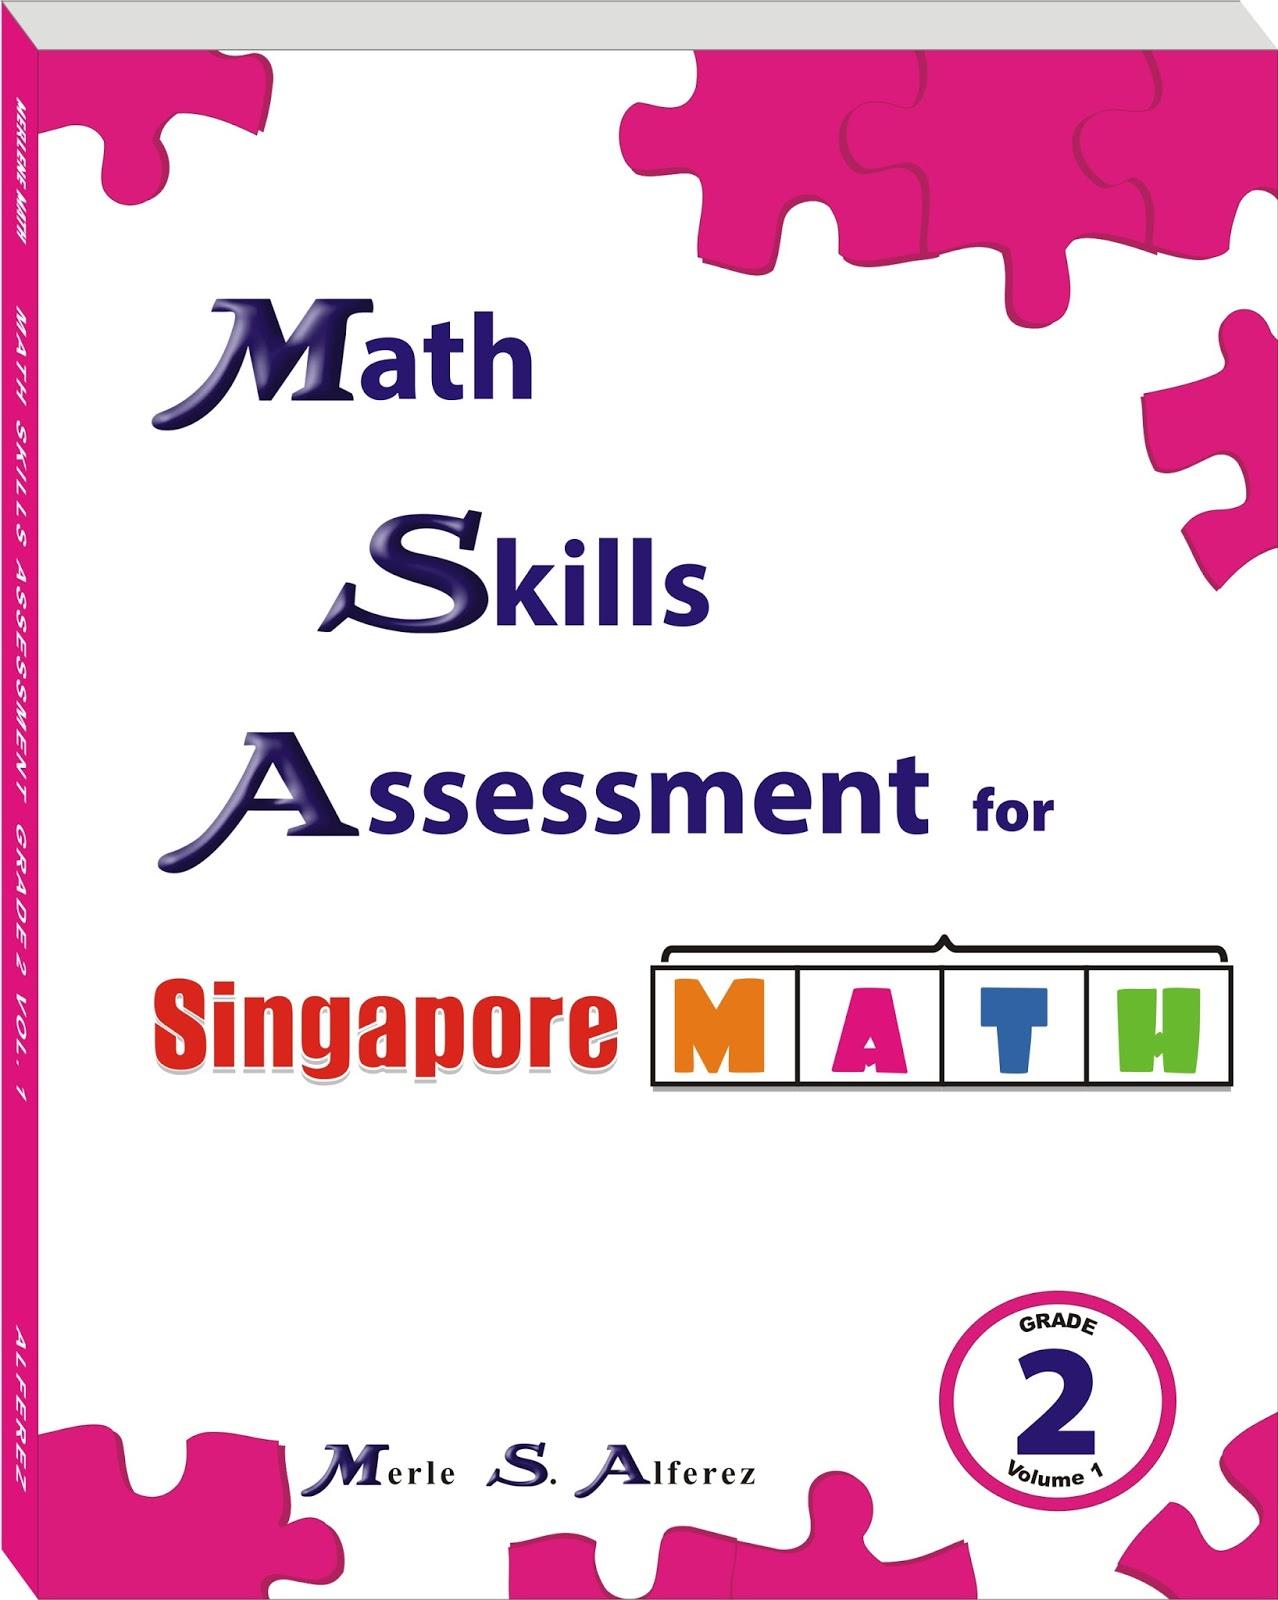 Singapore Math Books: Merle S. Alferez: Math Skills Assessment for ...